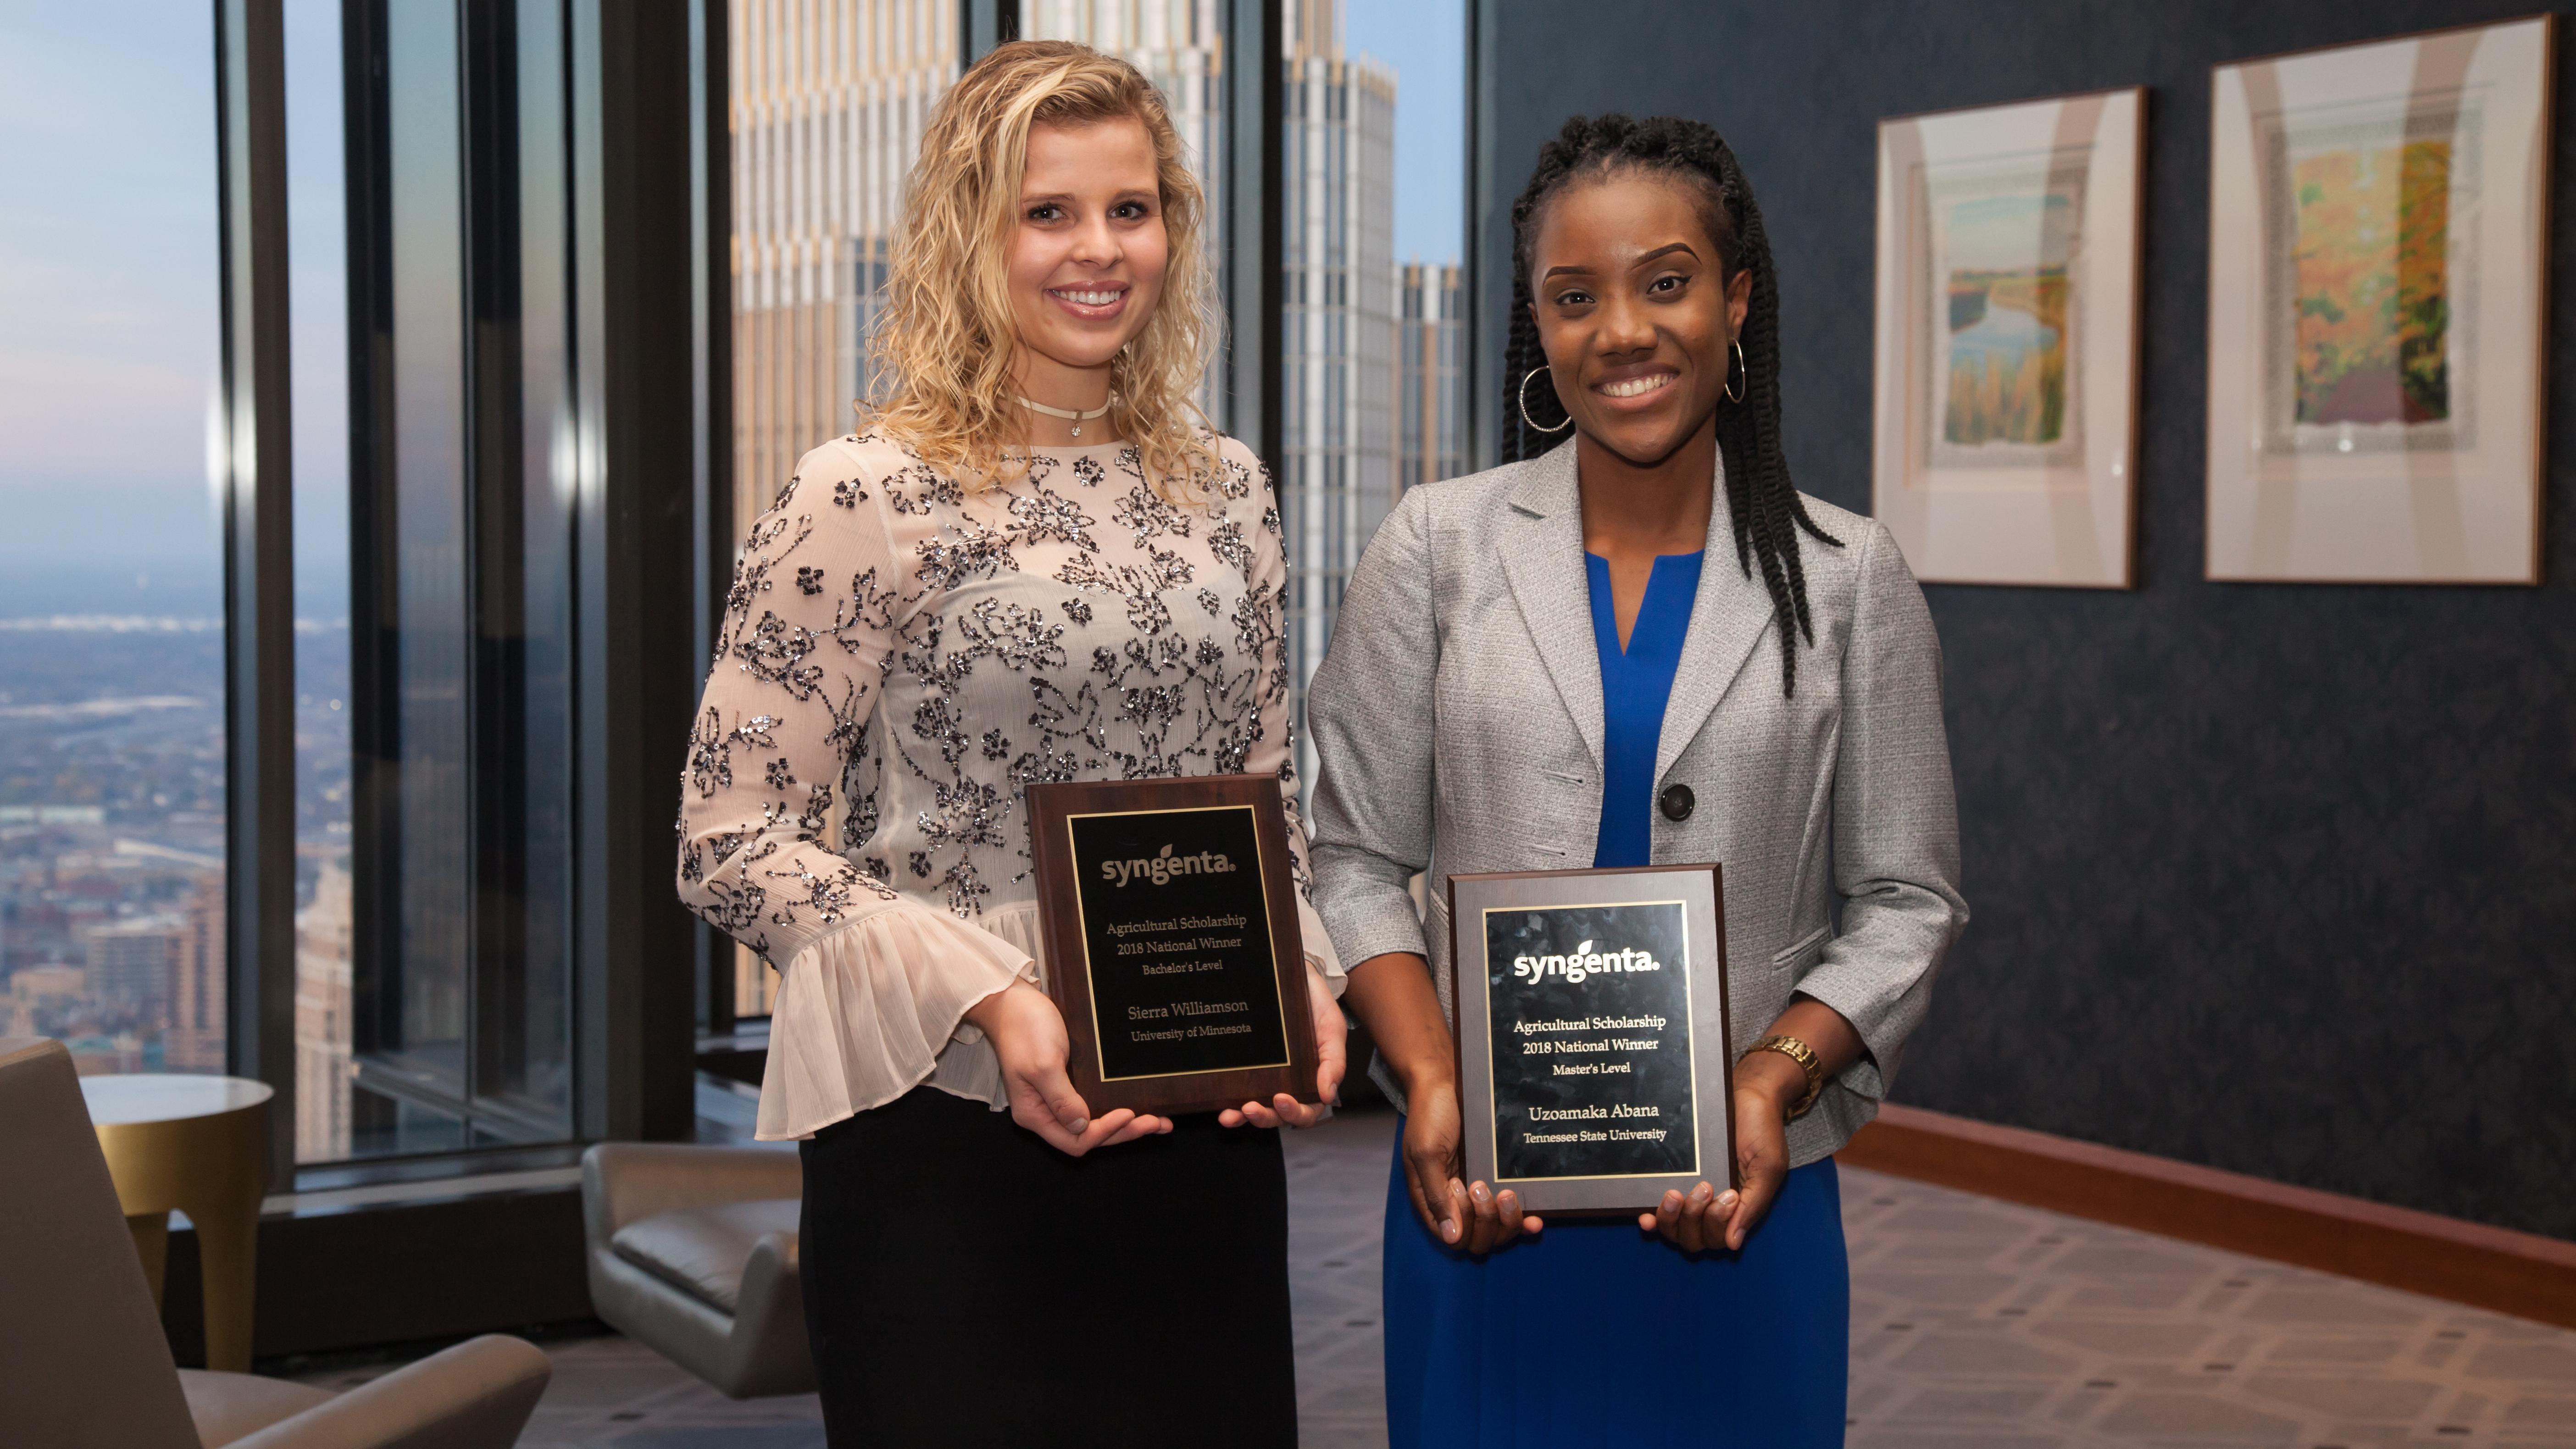 Syngenta Agricultural Scholarship program awards ag students who